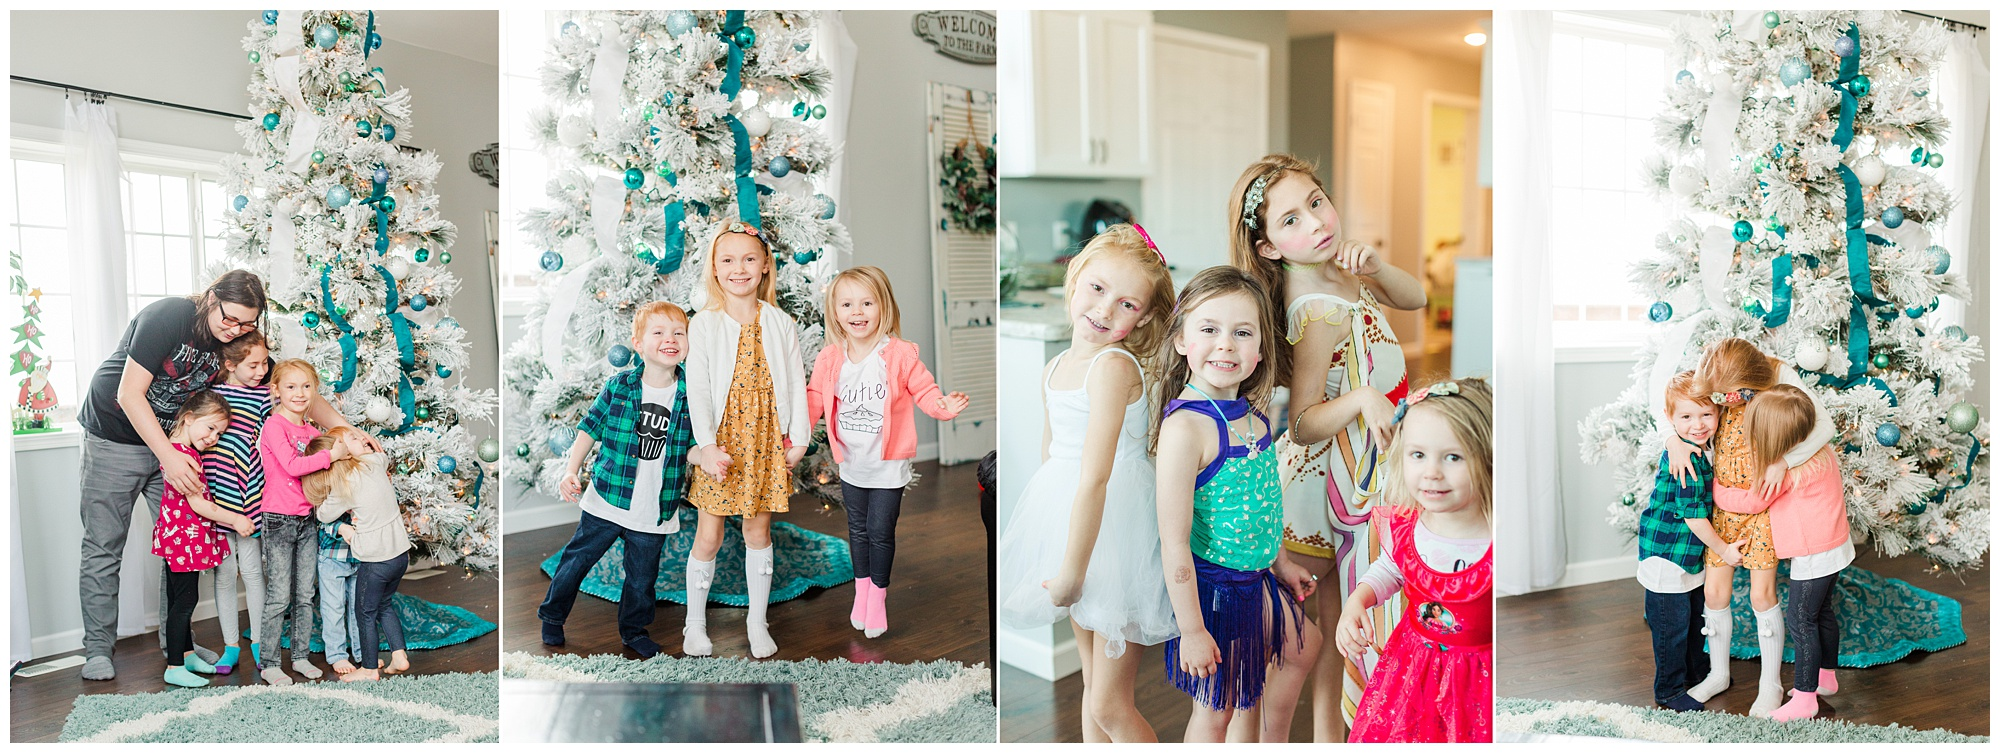 November Family Adventures